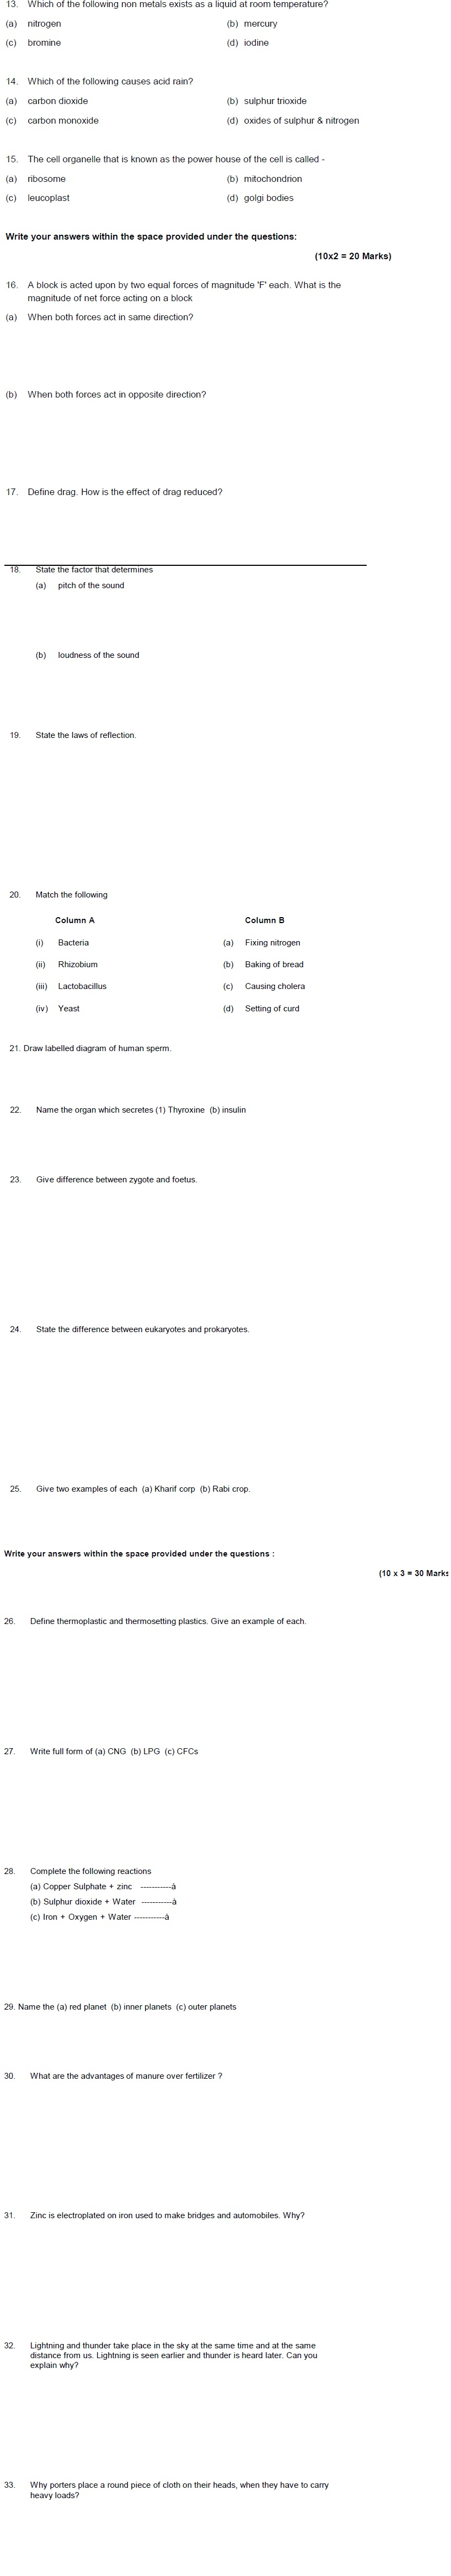 All Indian Sainik School Entrance Exam Sample Paper - Class IX